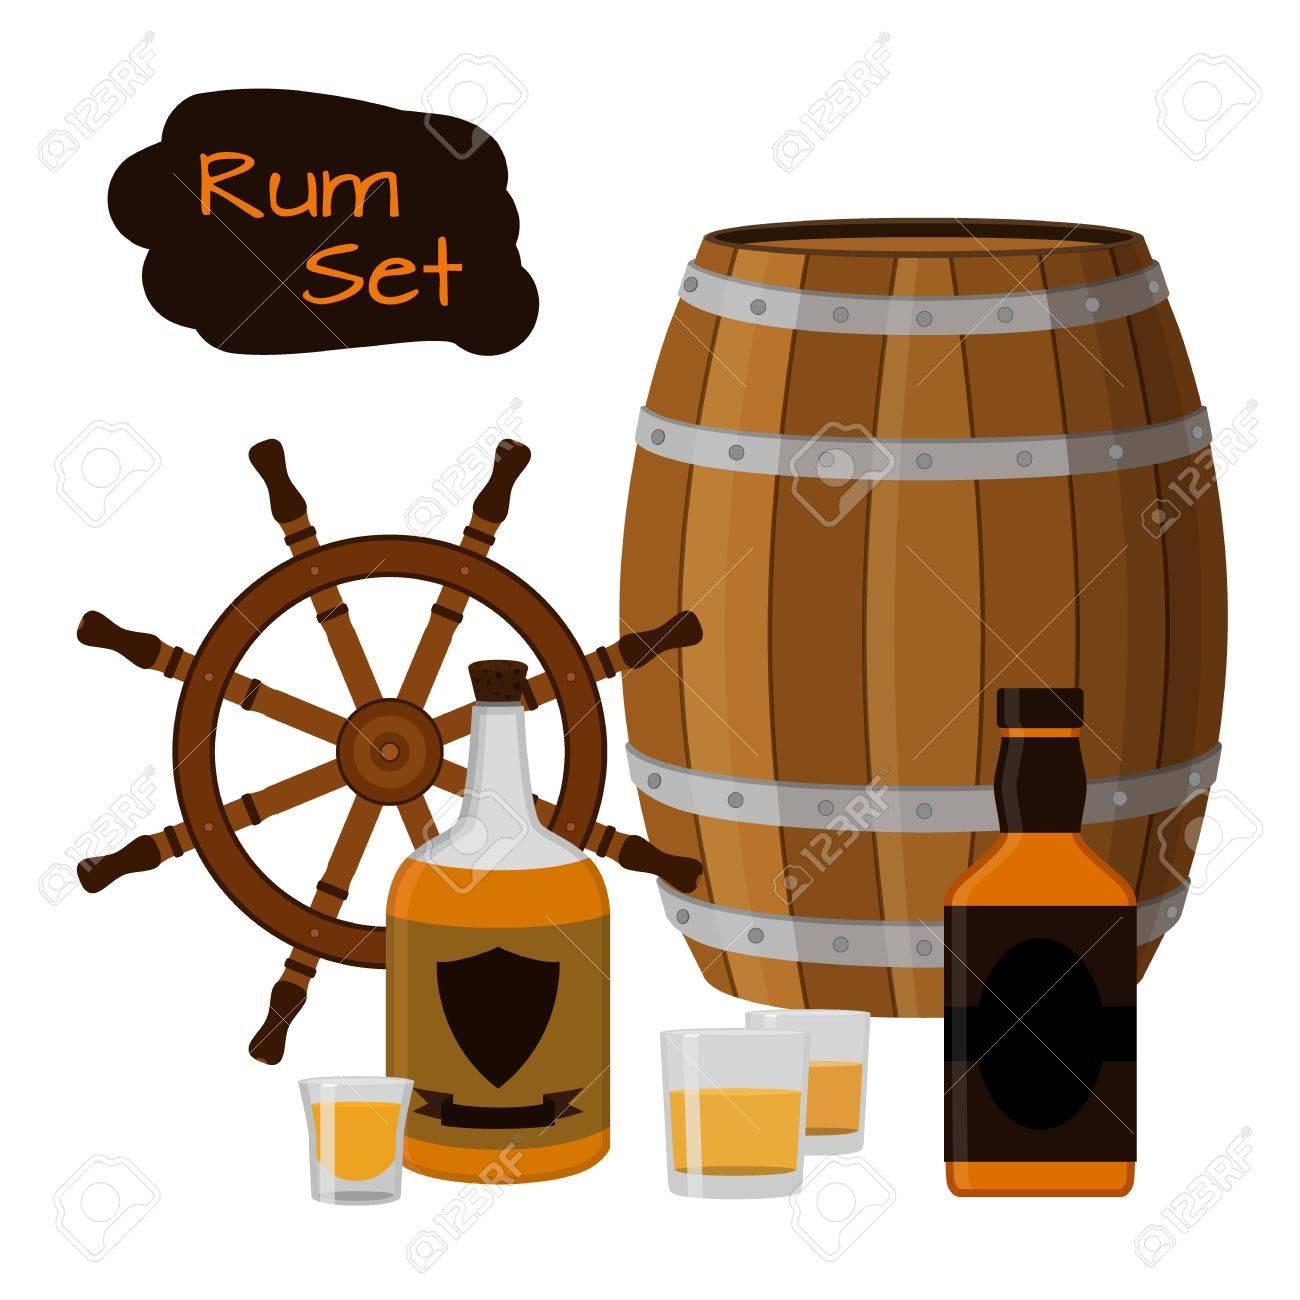 Design Helm rum set drink helm barrel bottles of rum